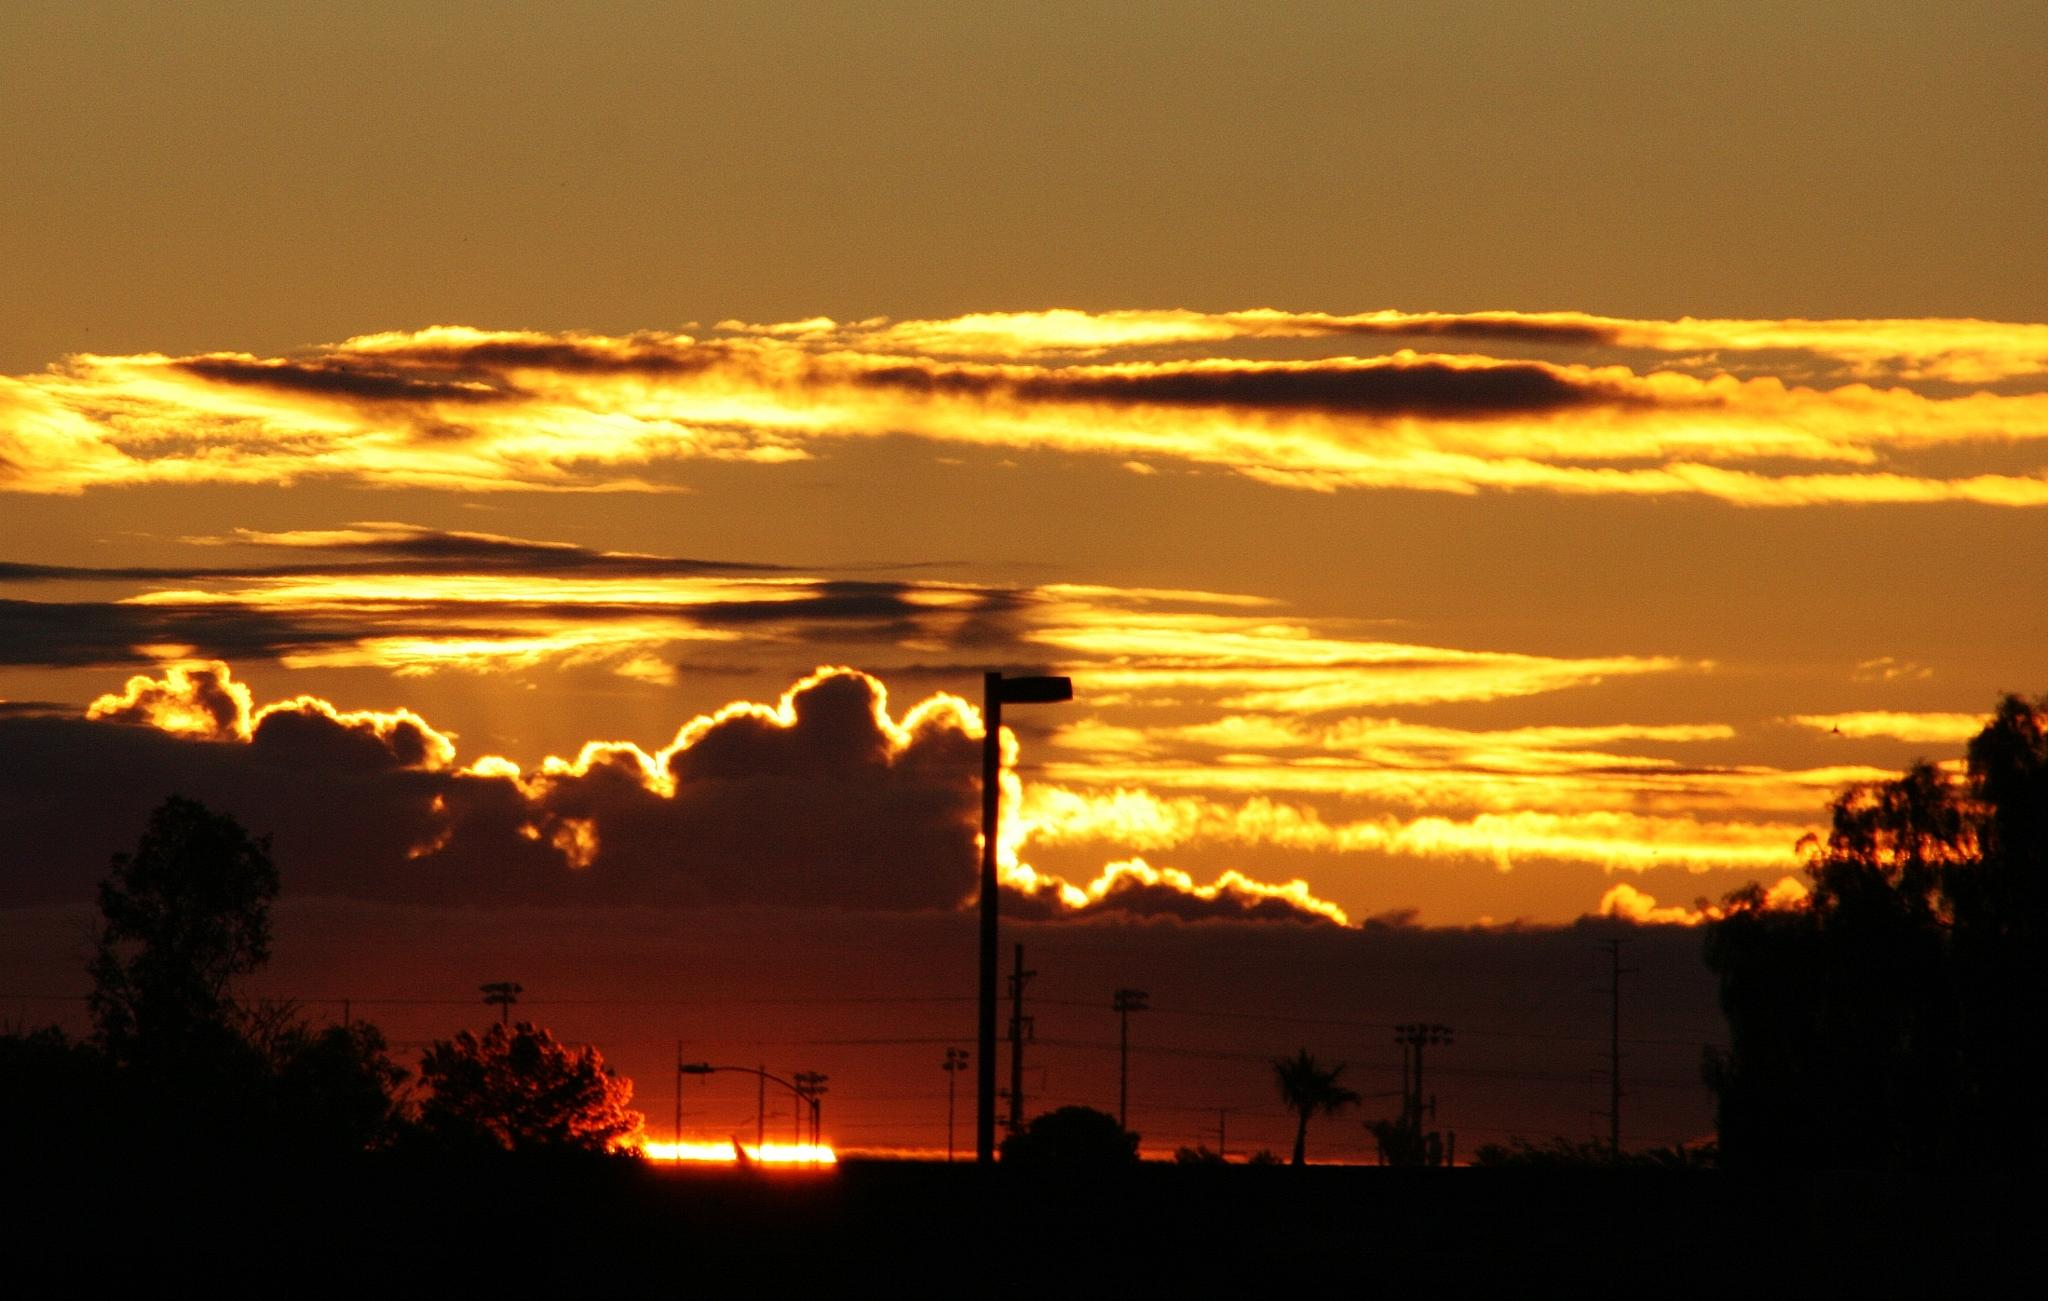 Cloudy Sunrise by kathy.larsen